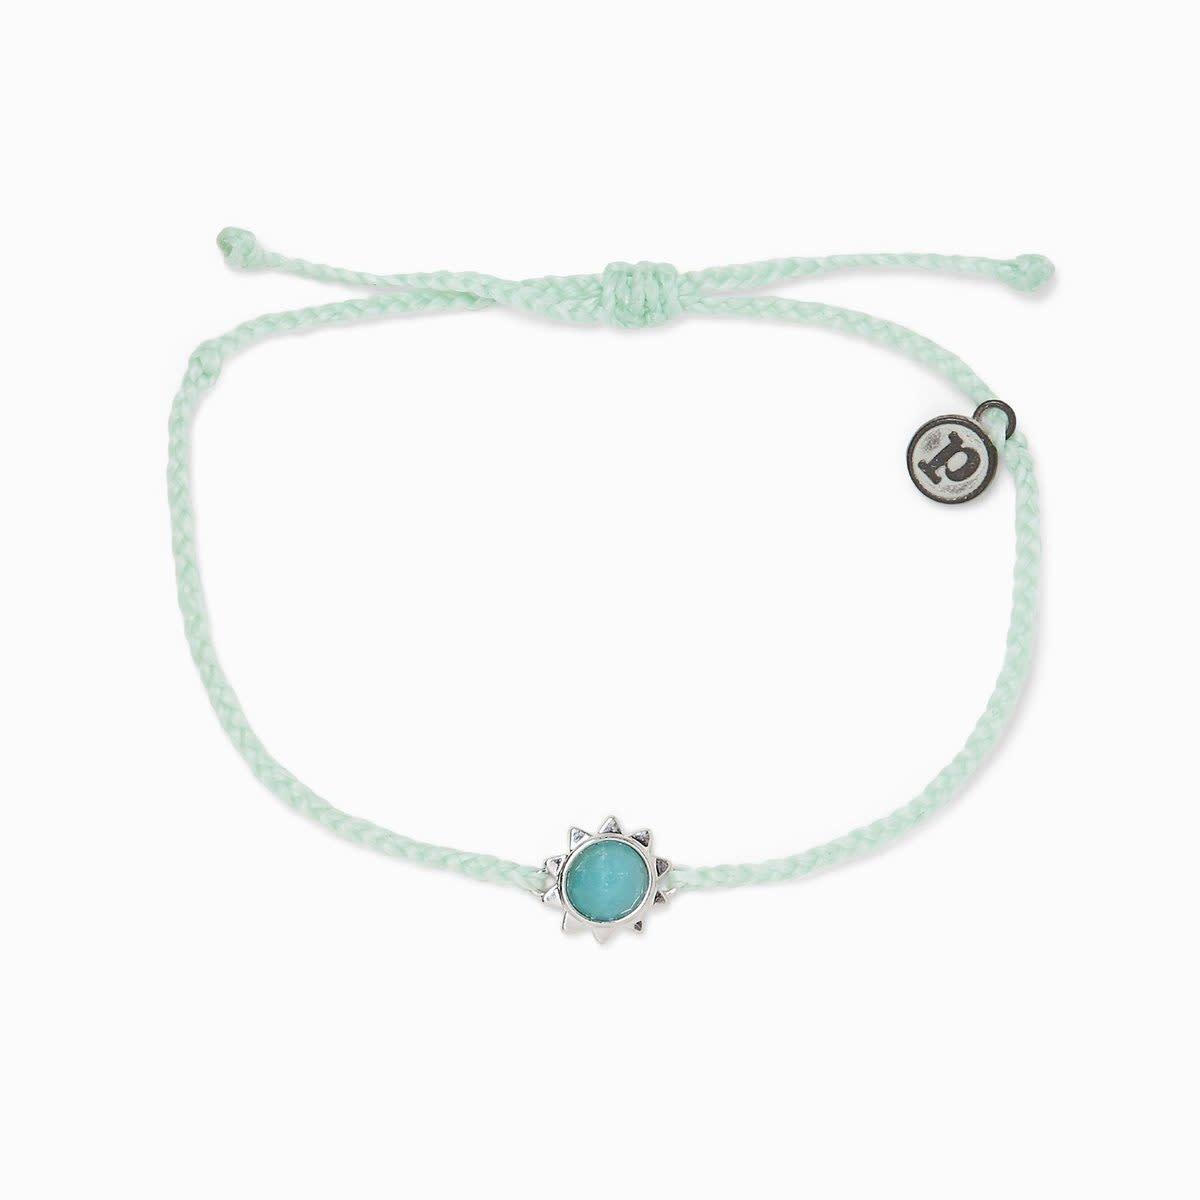 Puravida Sunkissed Silver Bracelet